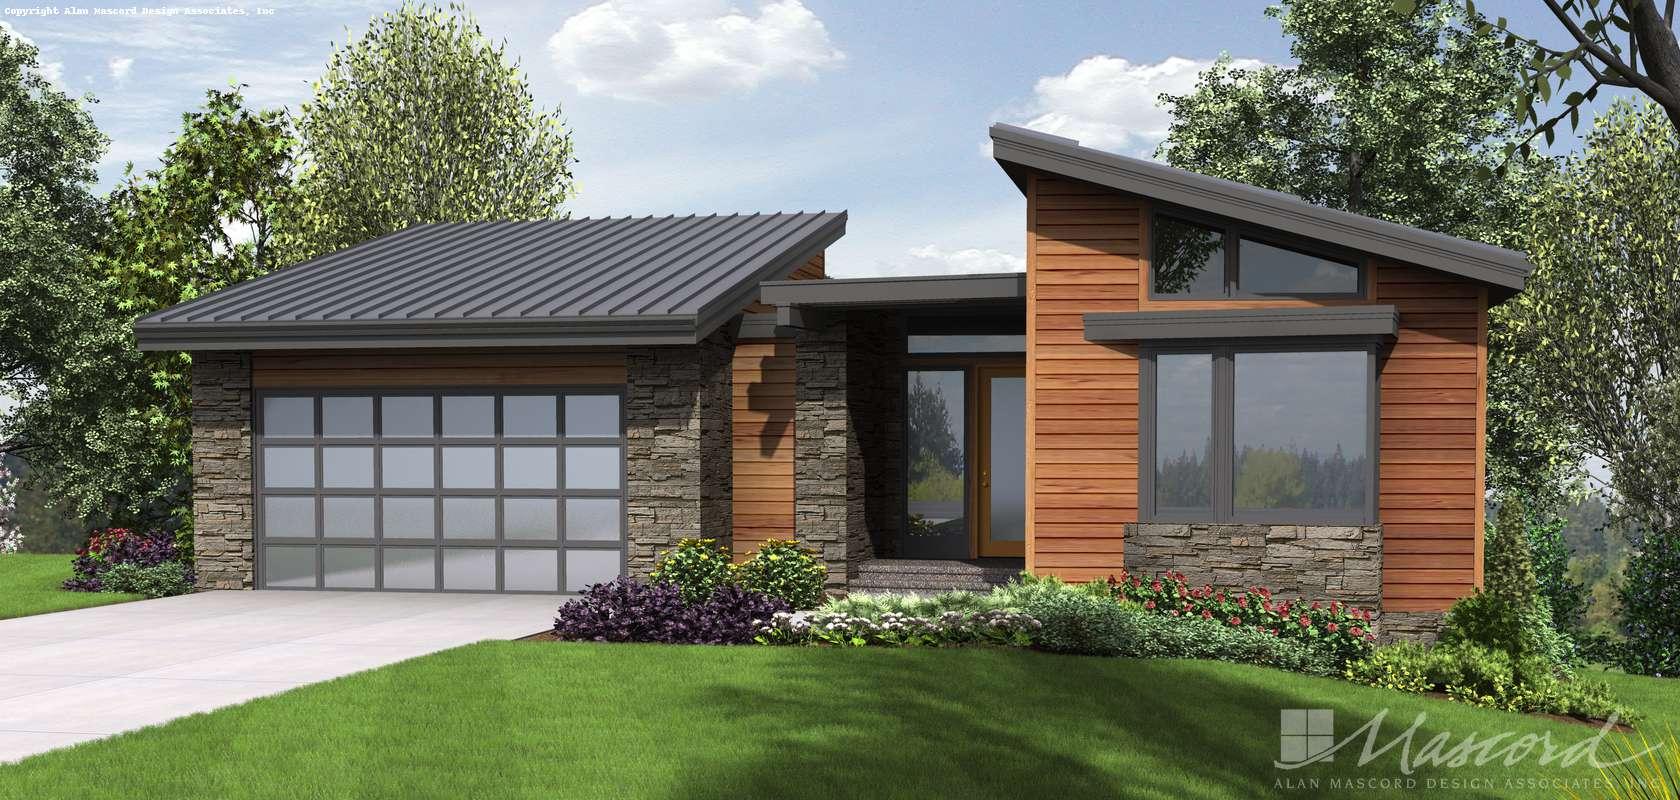 Mascord House Plan 1330: The Cormac